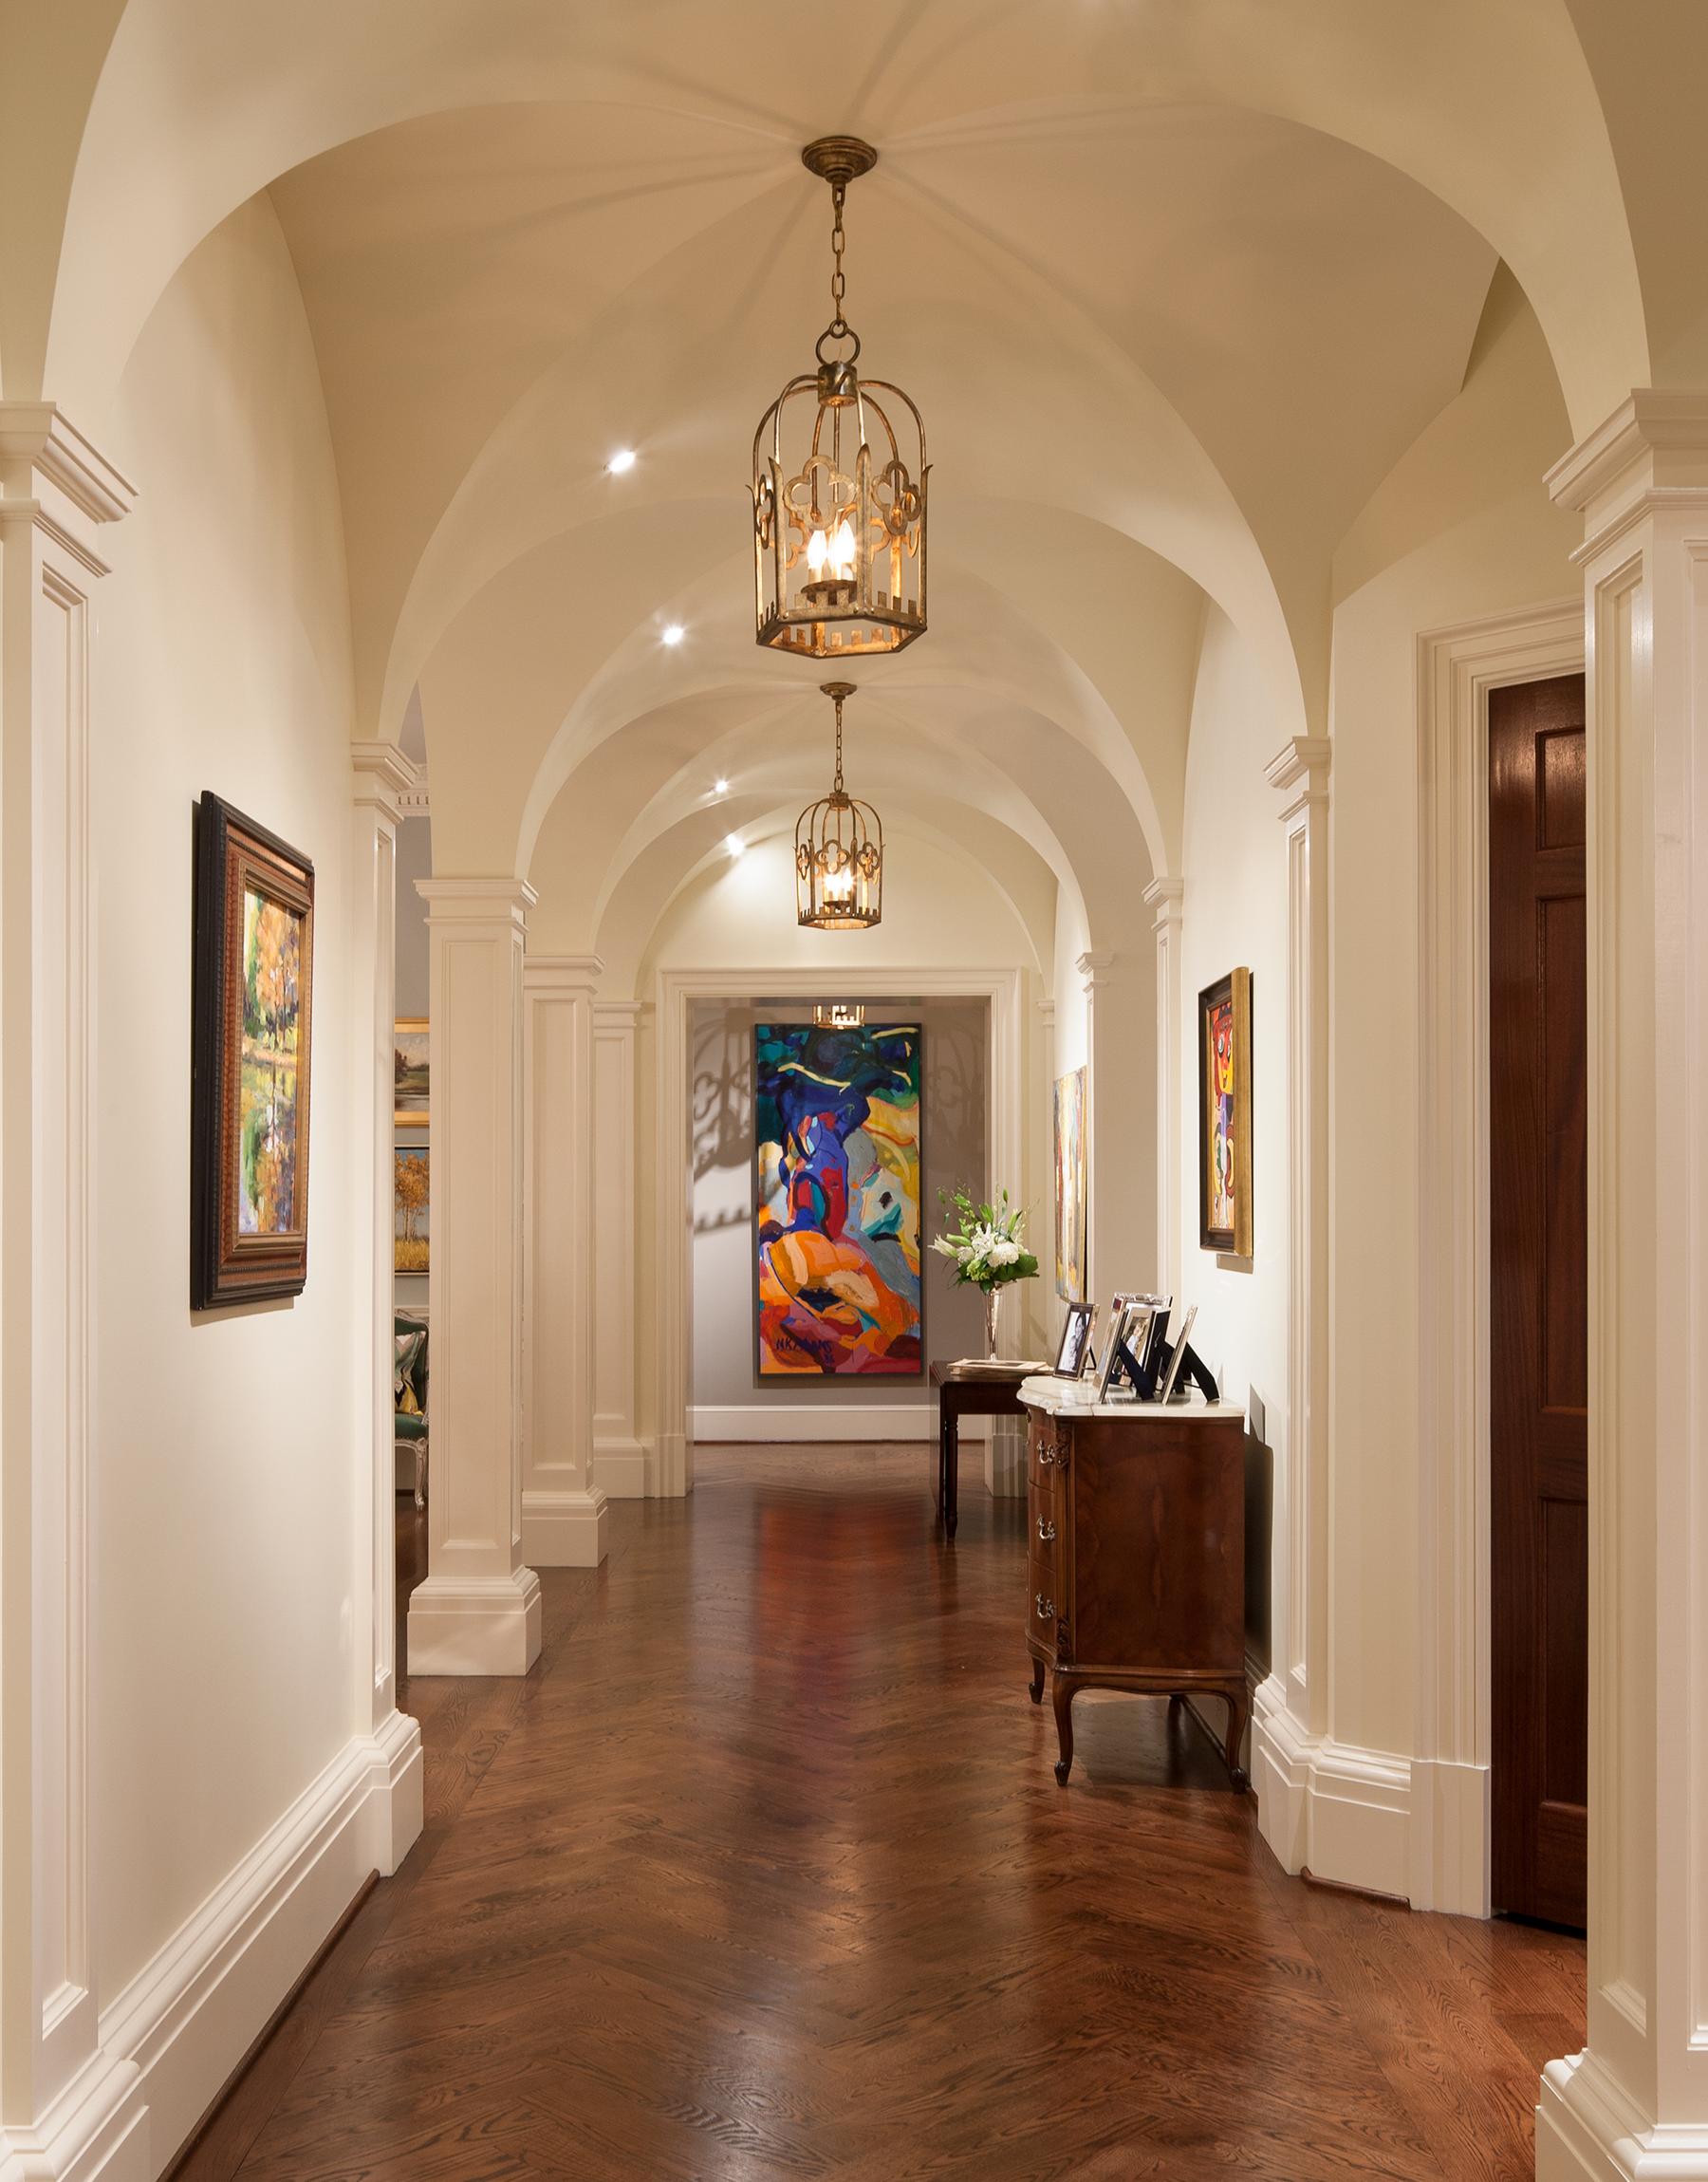 Hallway - Johnson House Art Collection, William T. Baker